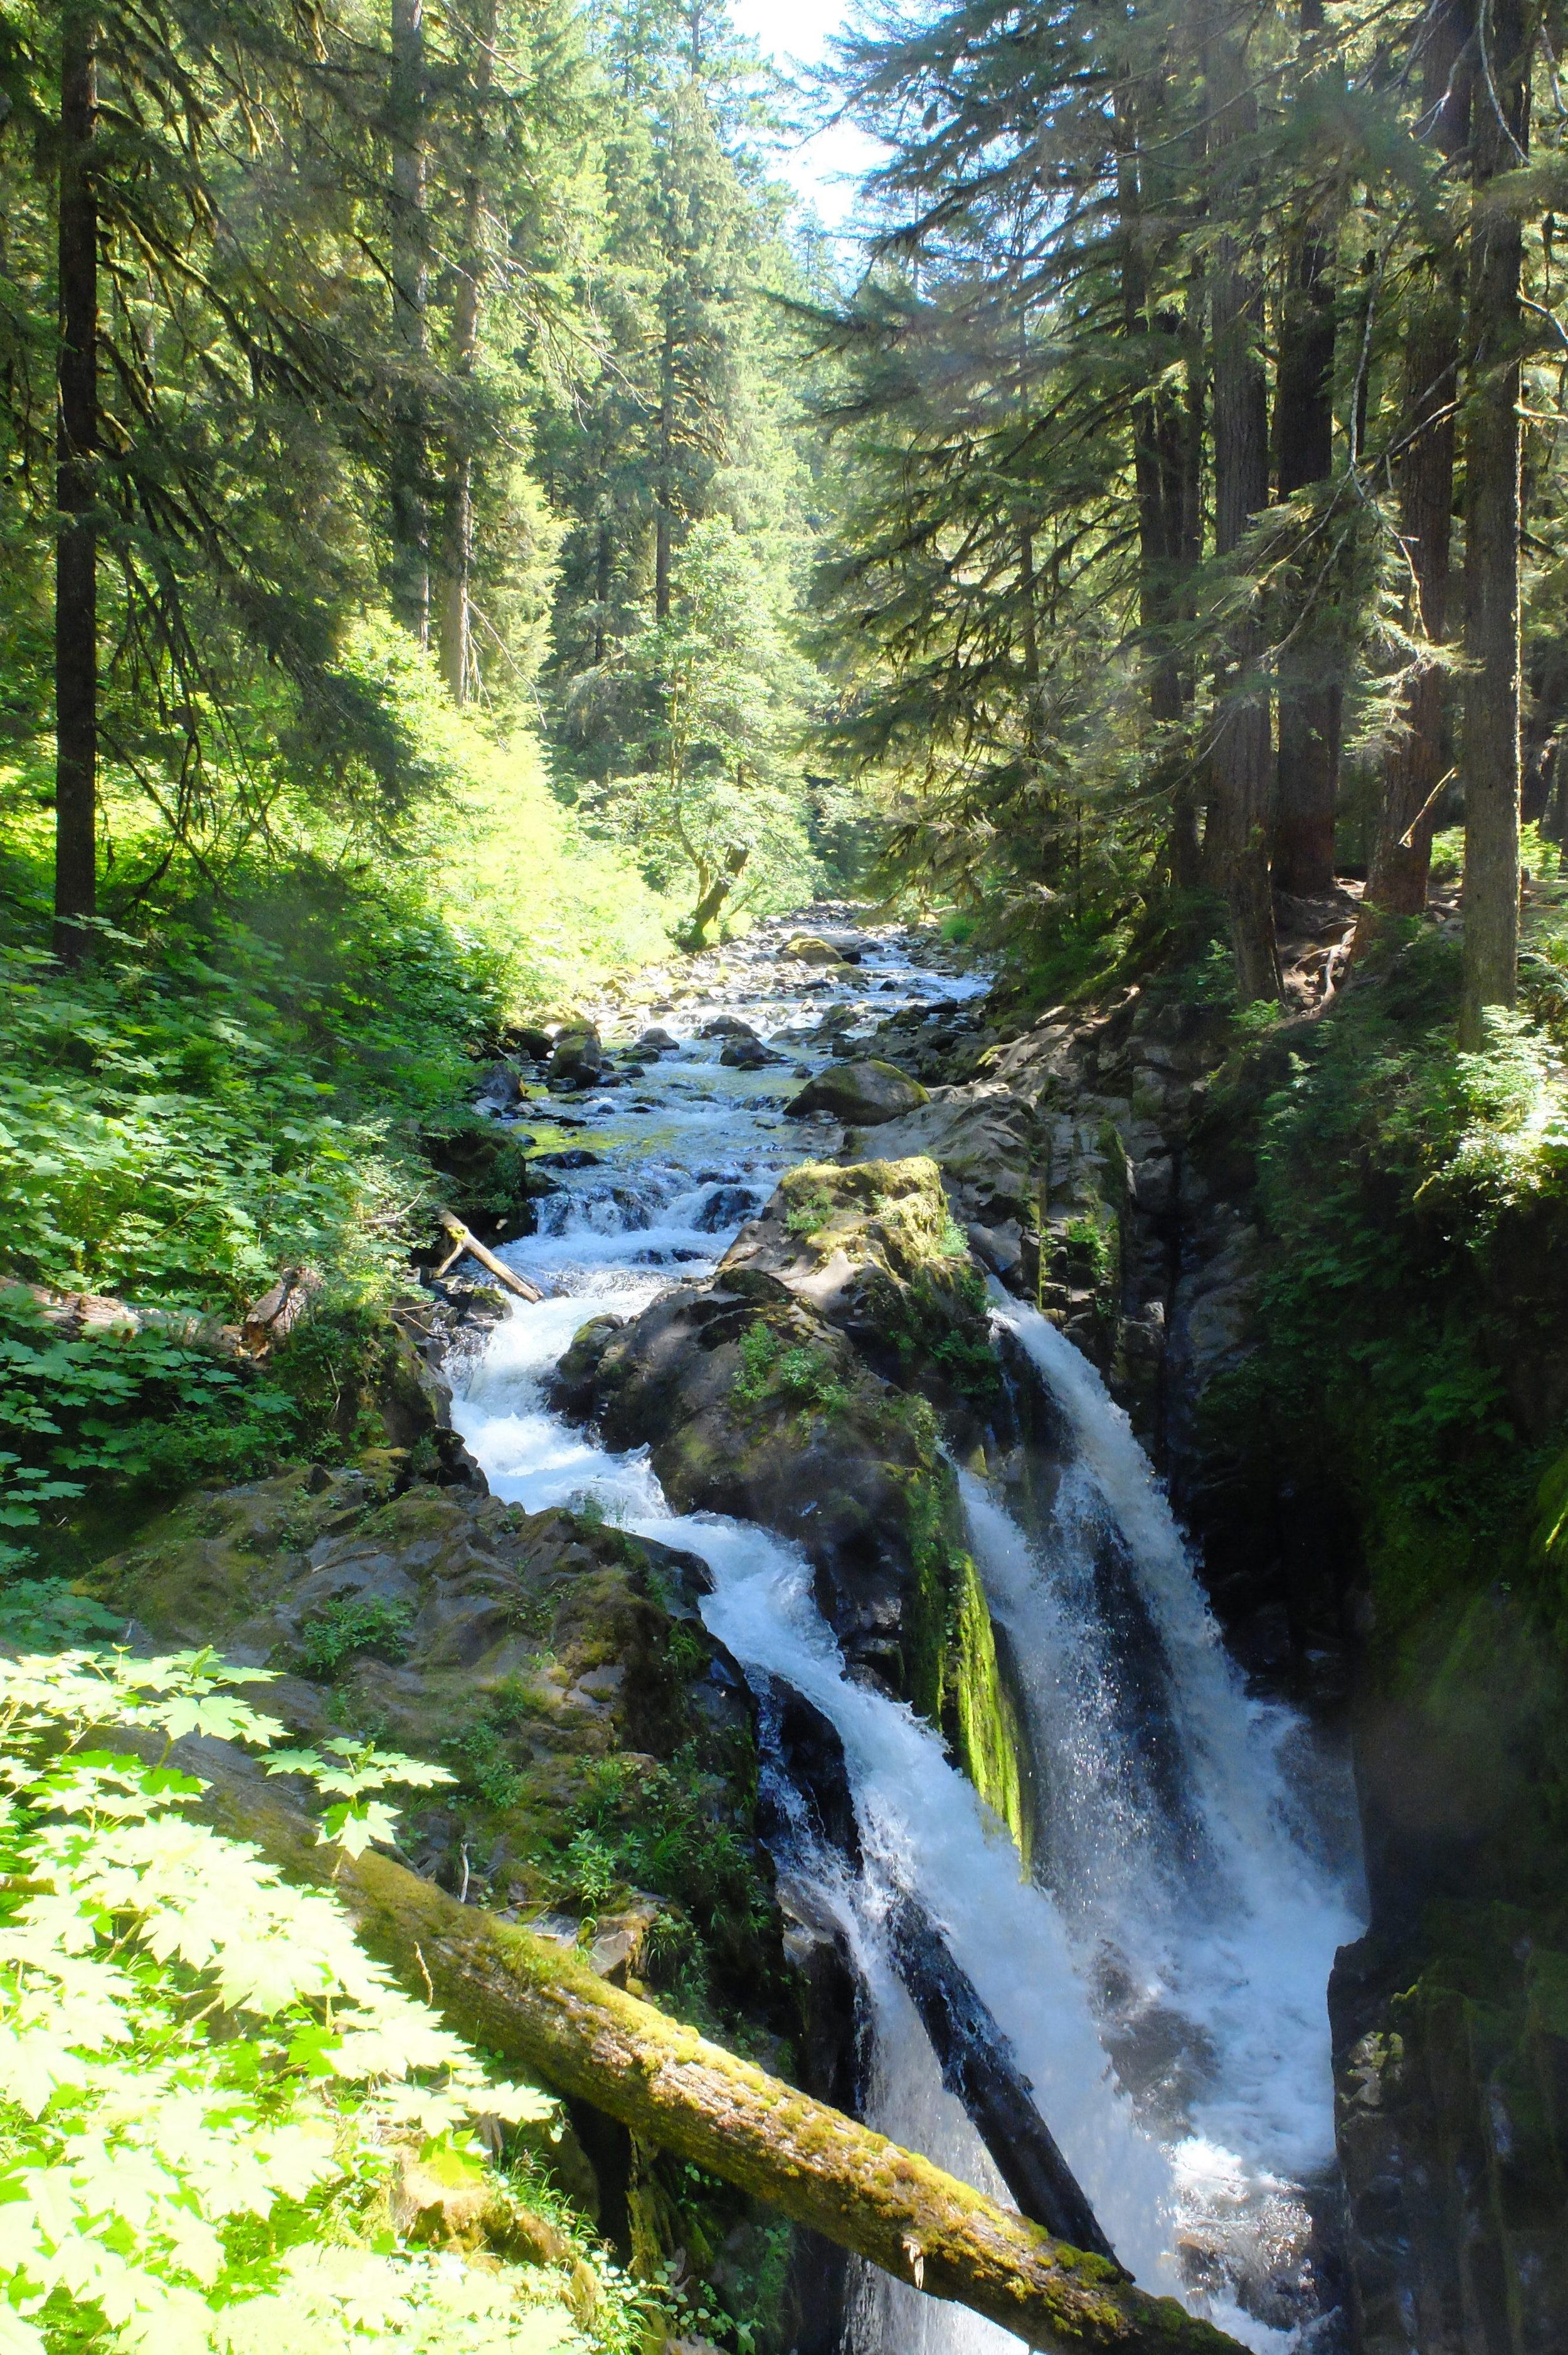 Waterfall, on the way to Deer Lake